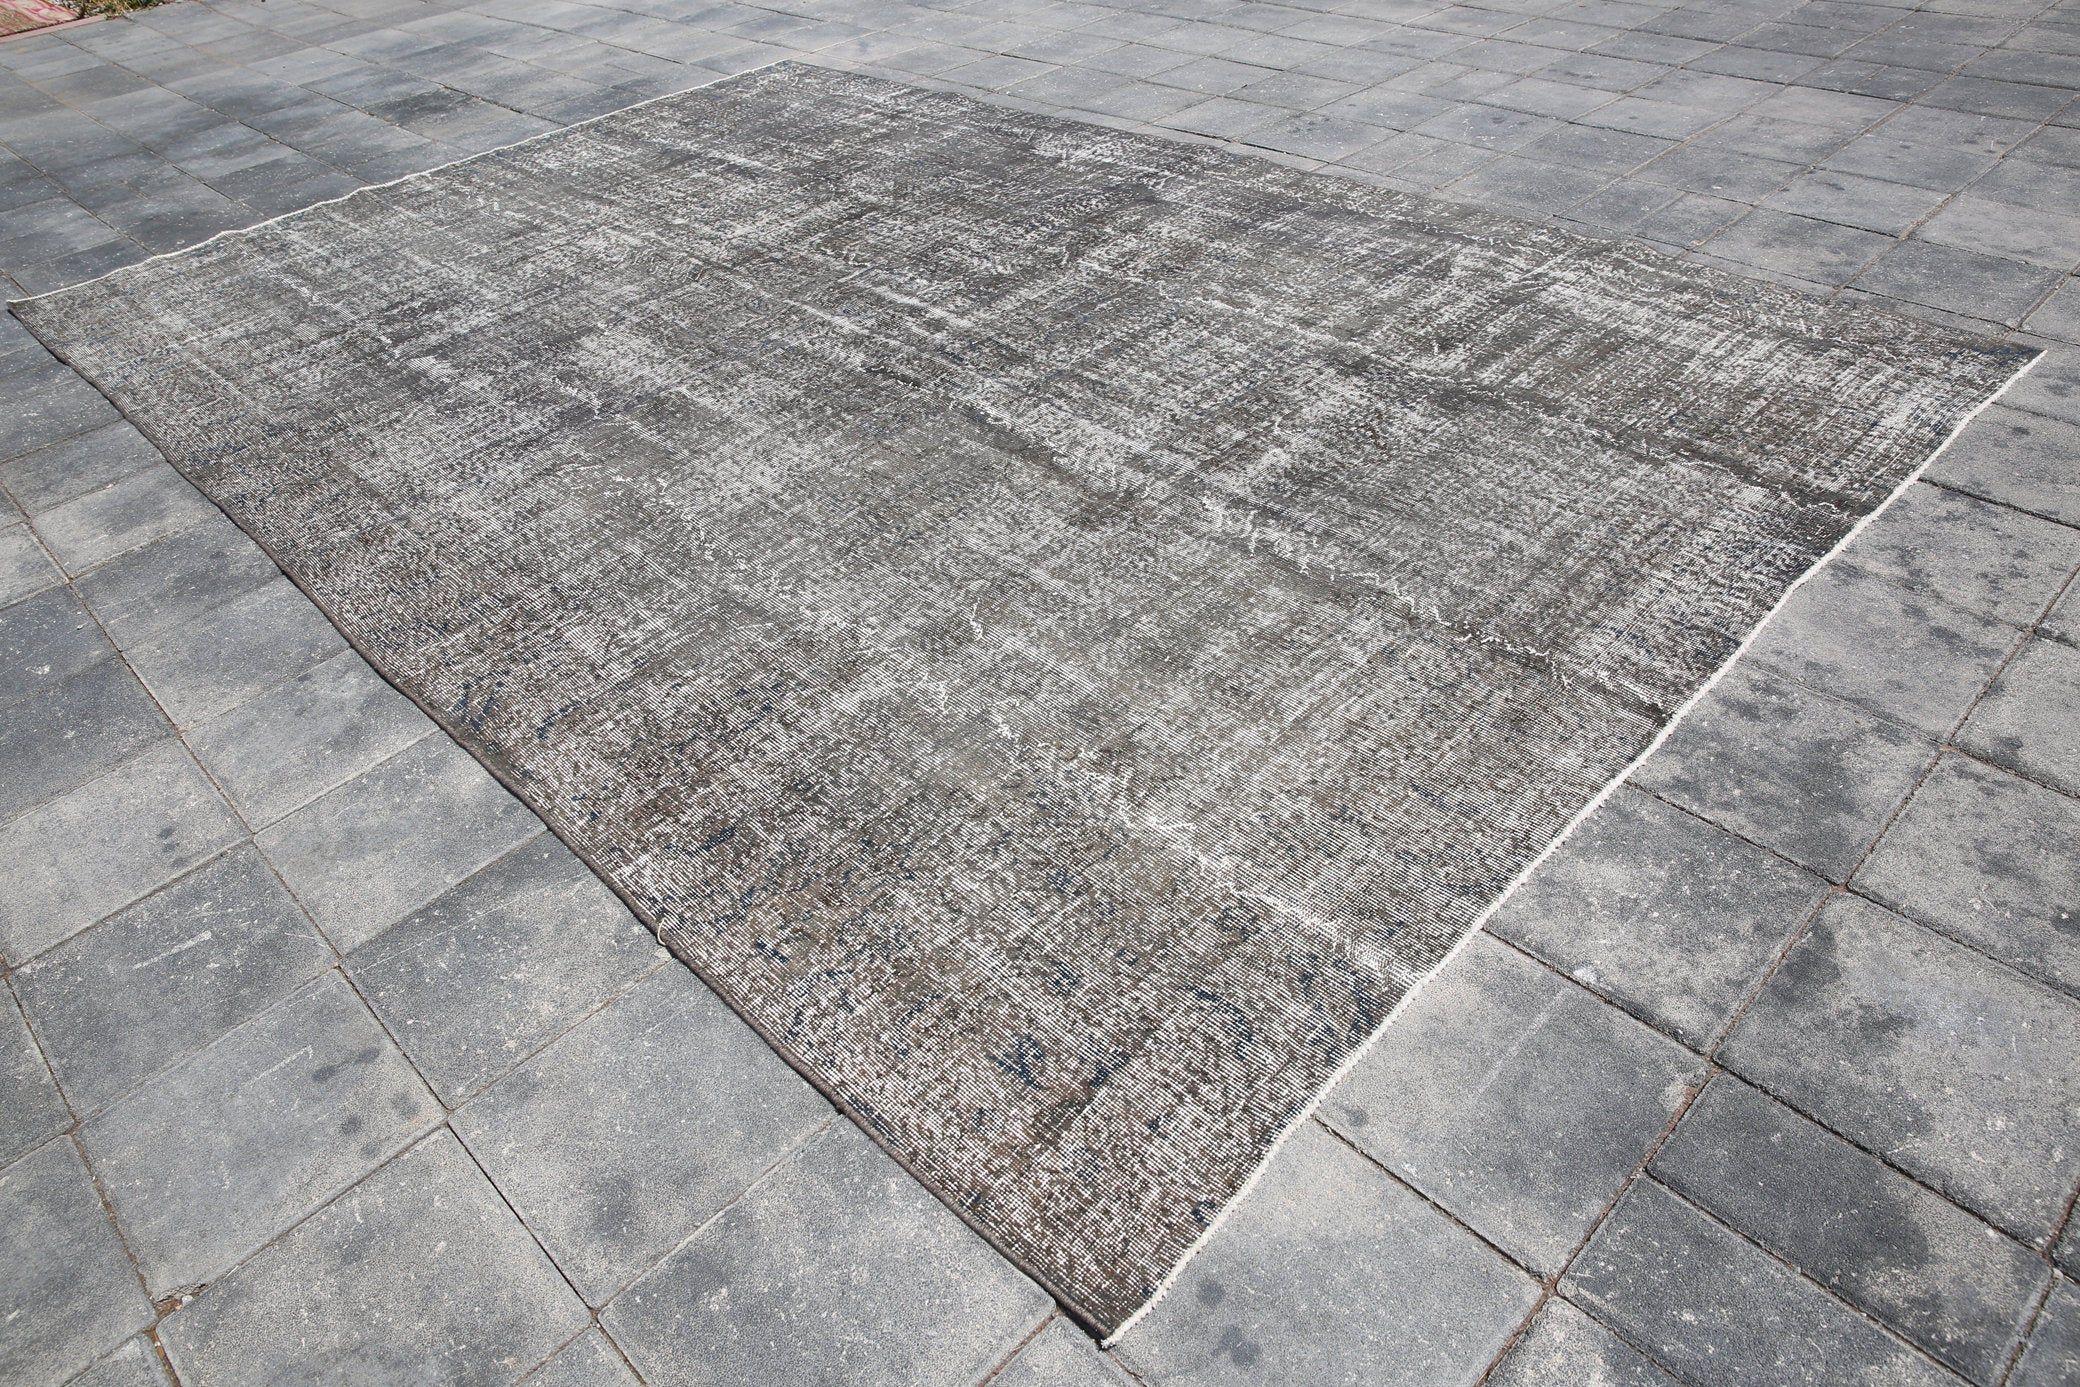 Oversized Rug,Gray Rug,Turkish Rug,Oushak Rug,Large Floor Rug,Vintage Rug,Anatolian Rug,Numadic Rug,Big area rug,7'7×8'7 Ft SKU:3736,Kilims